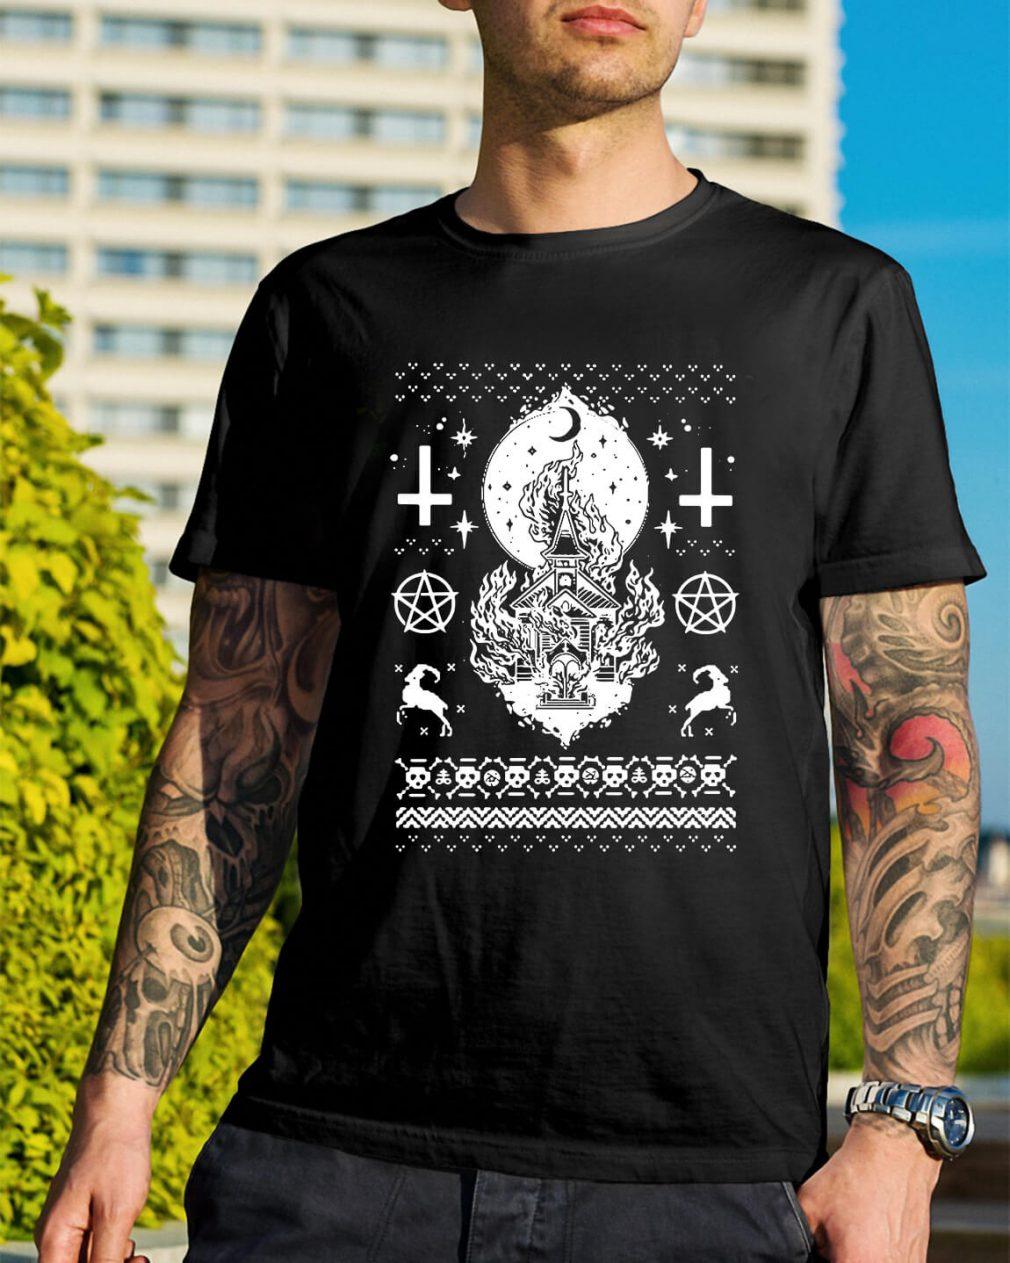 Synagogue burning church Christmas ugly Guys Shirt